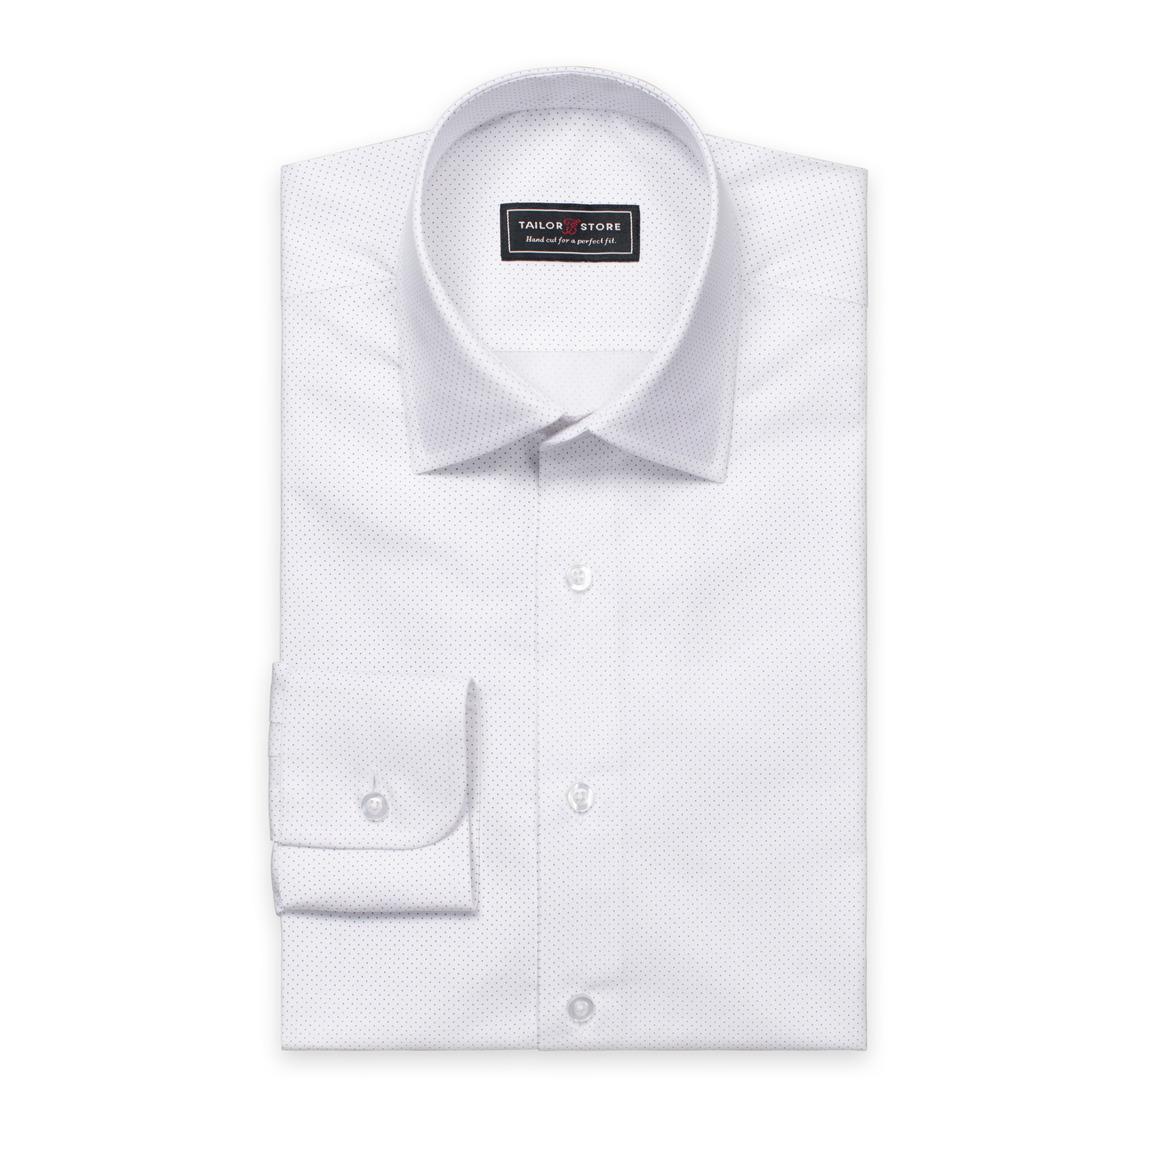 White/Navy dotted poplin shirt